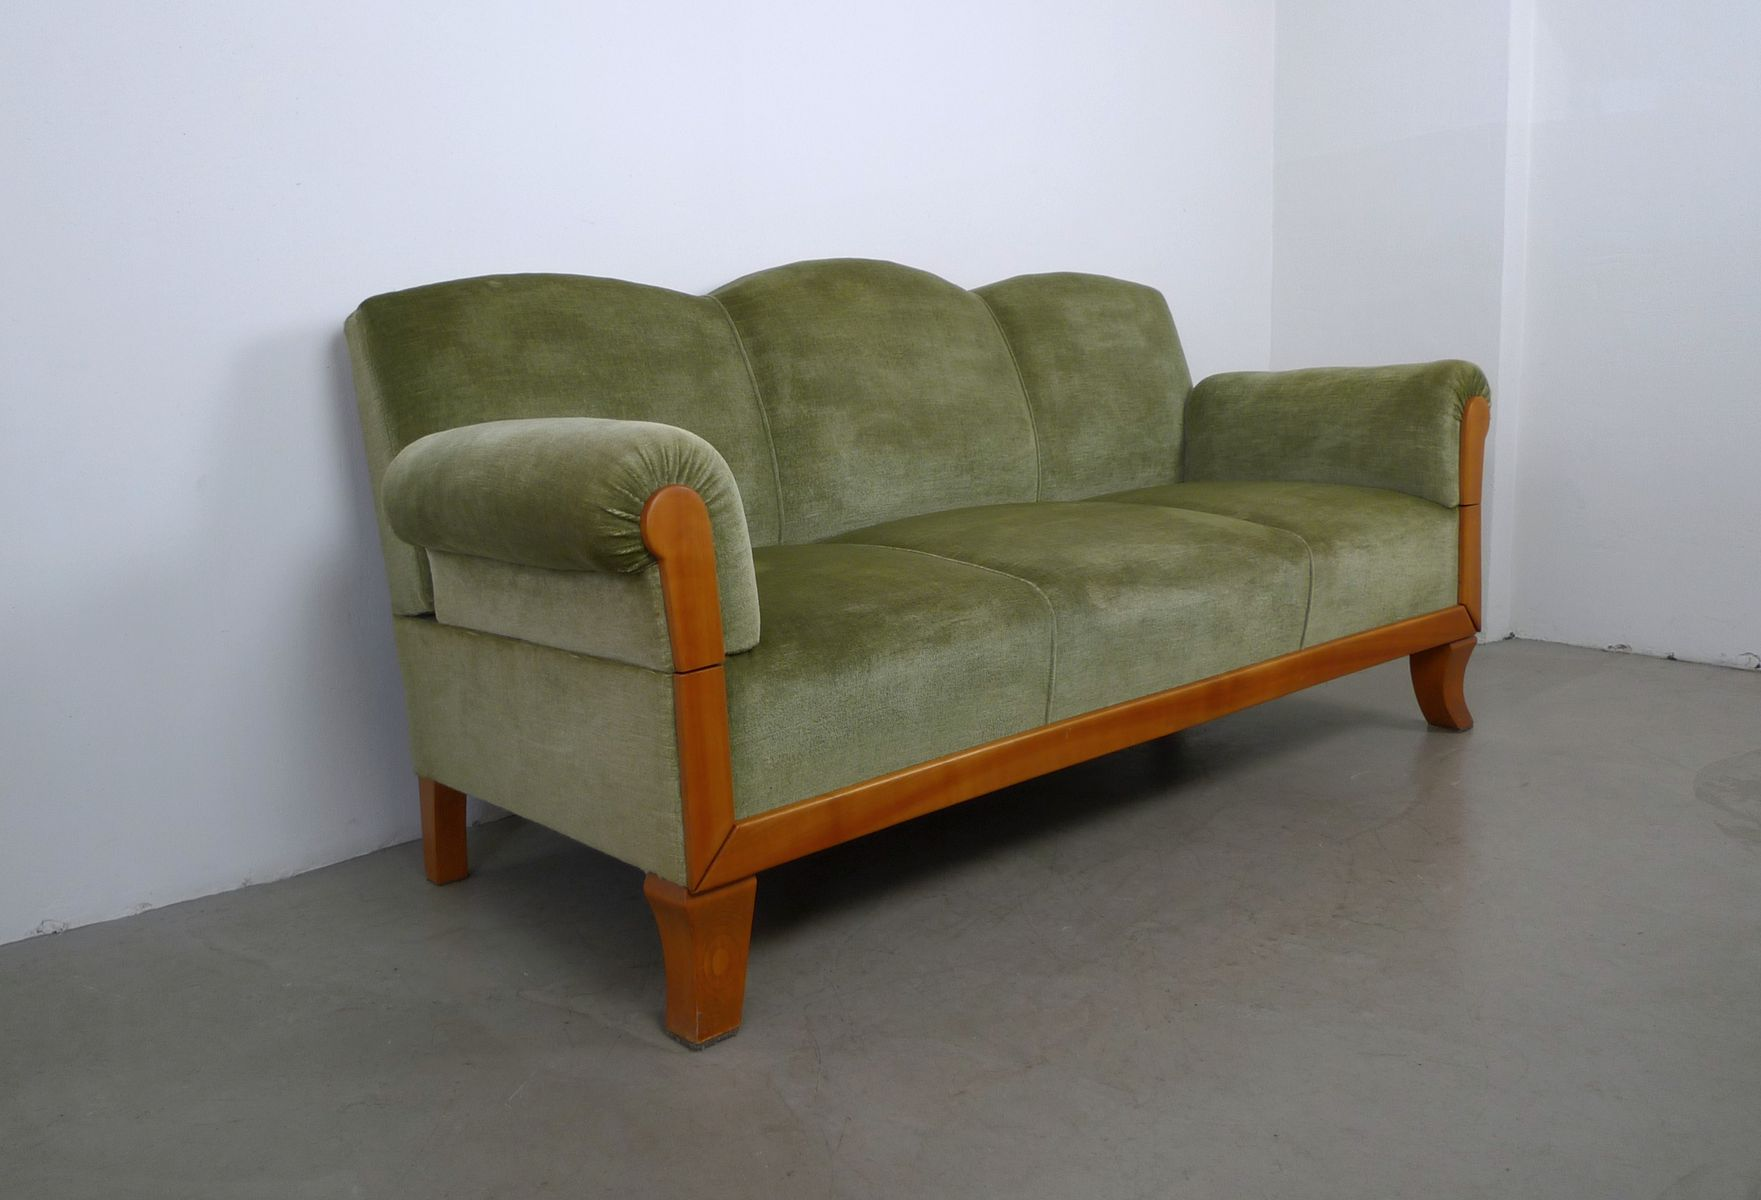 3 sitzer sofa aus kirschholz von joseph kreuzburg 1930er. Black Bedroom Furniture Sets. Home Design Ideas